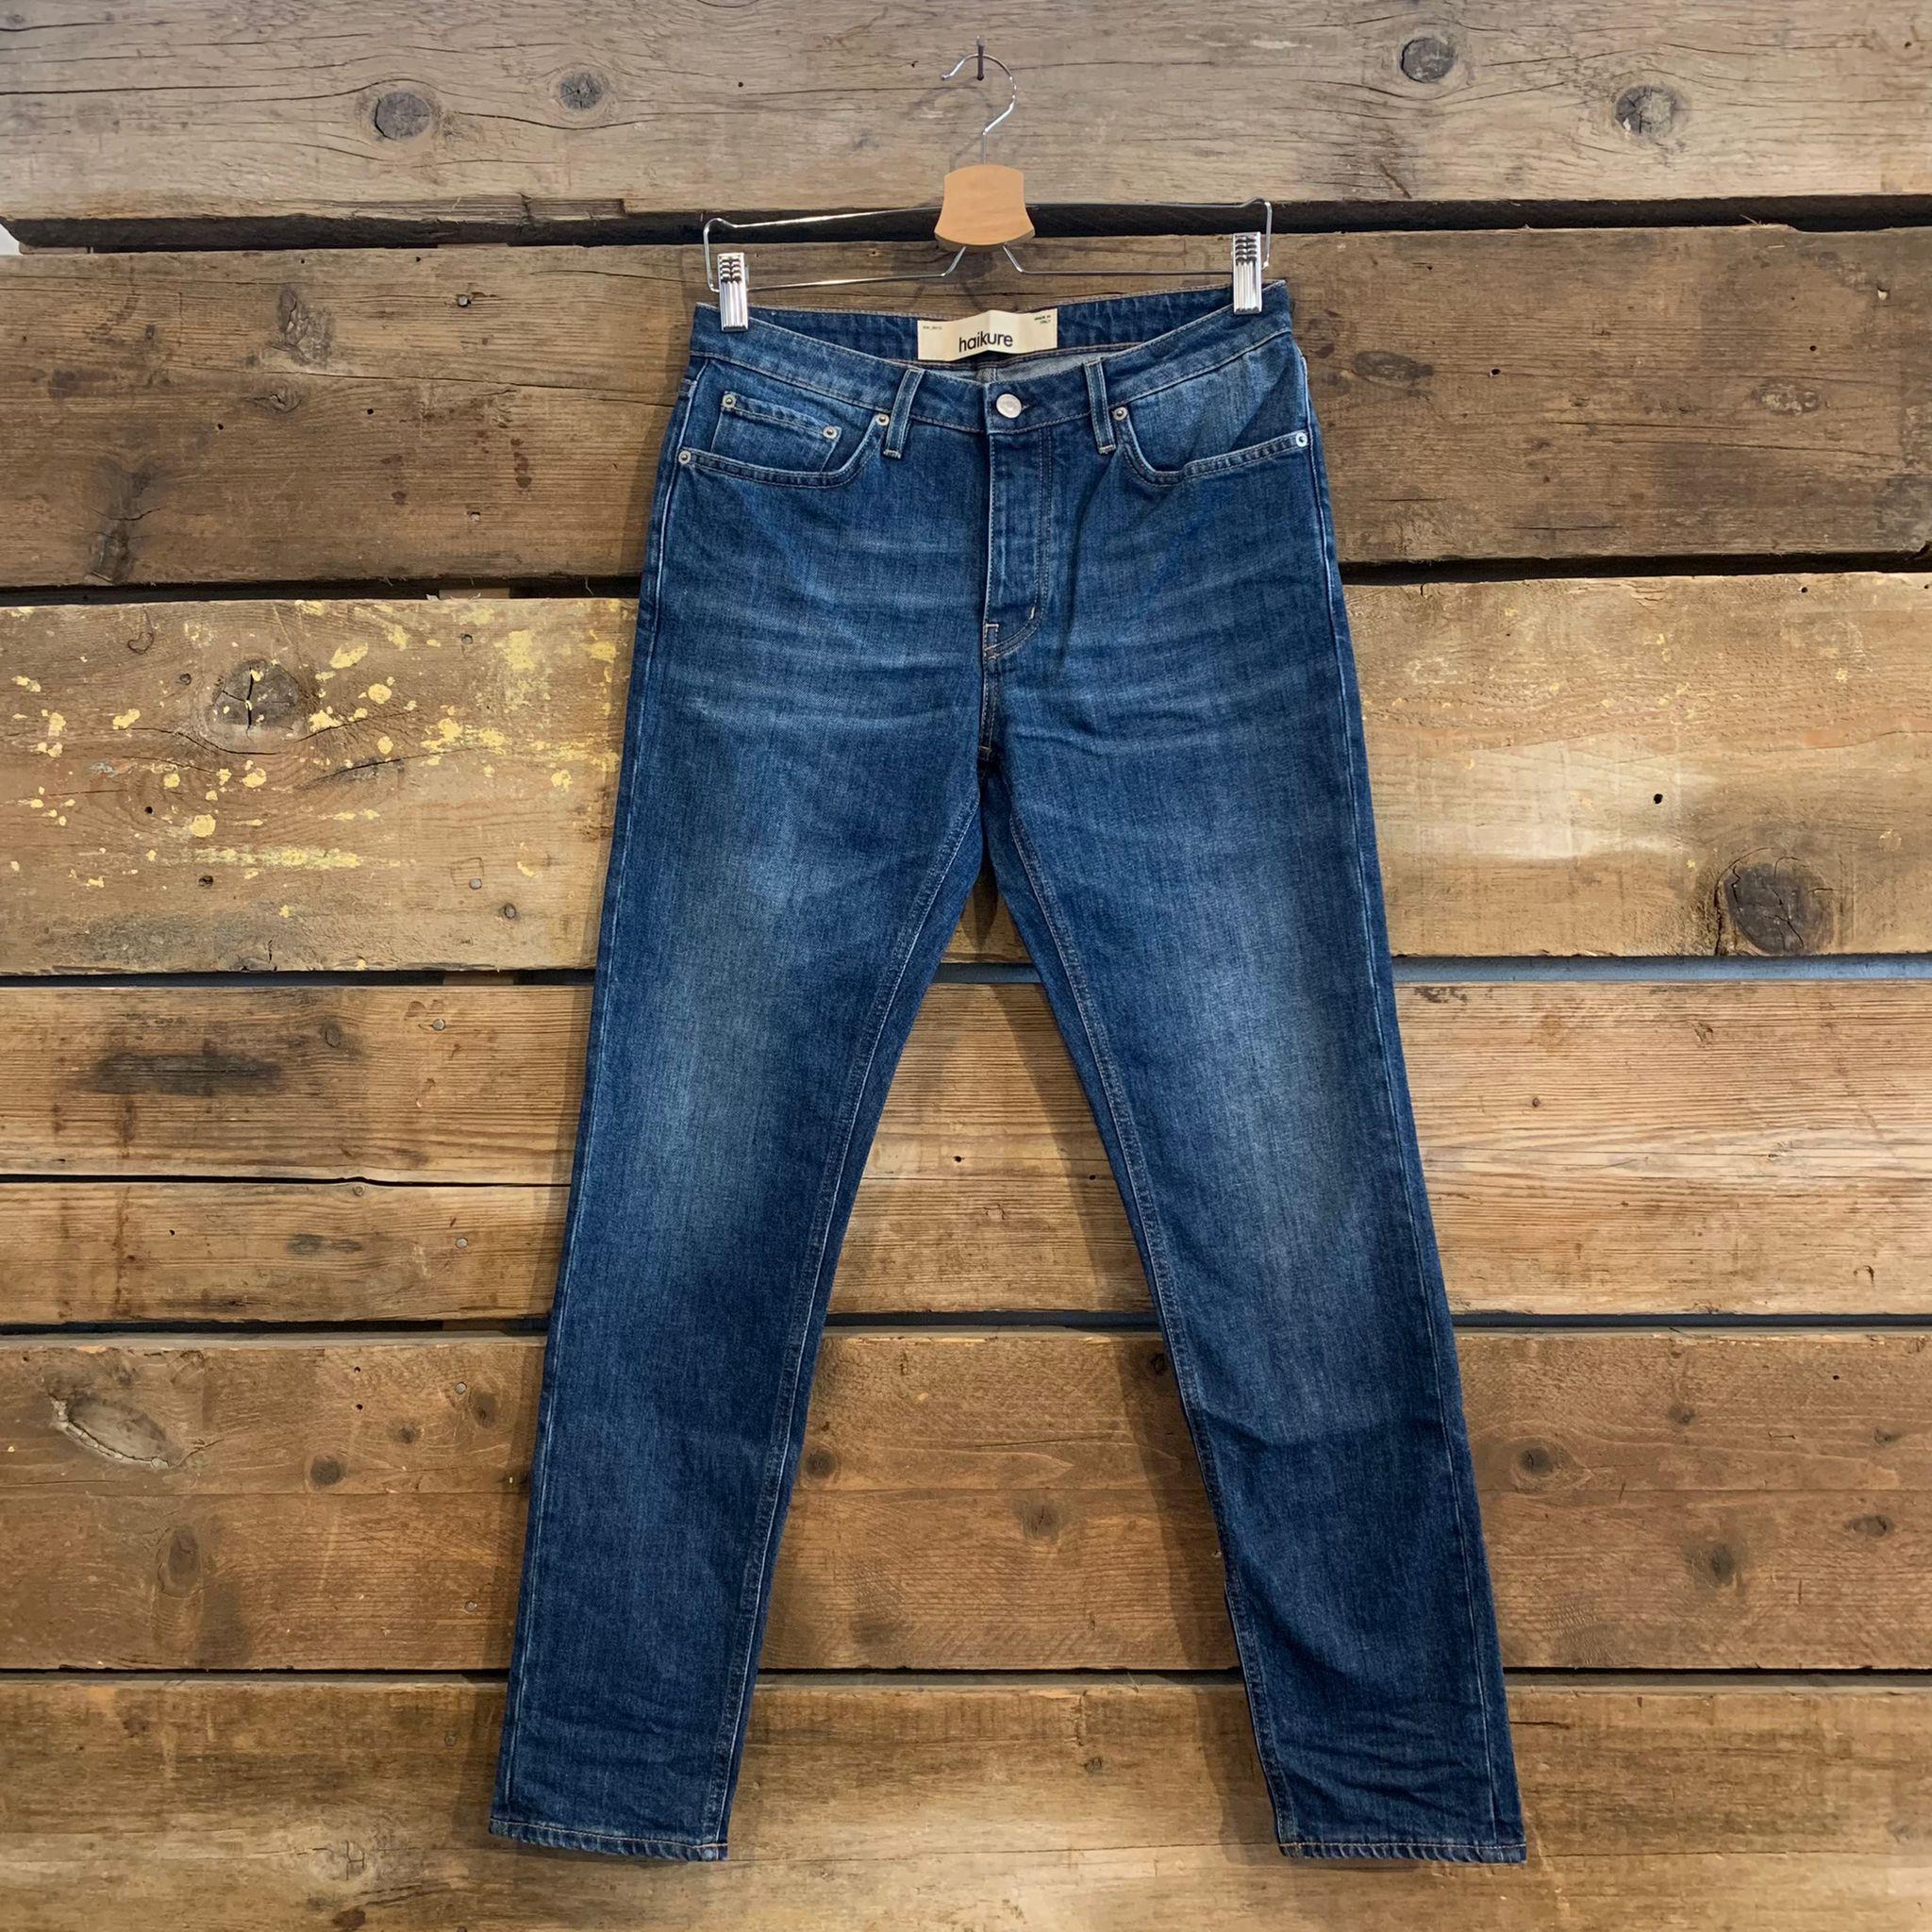 Jeans Haikure Uomo Cleveland Crop Comfort Pure Blu Pure Indigo